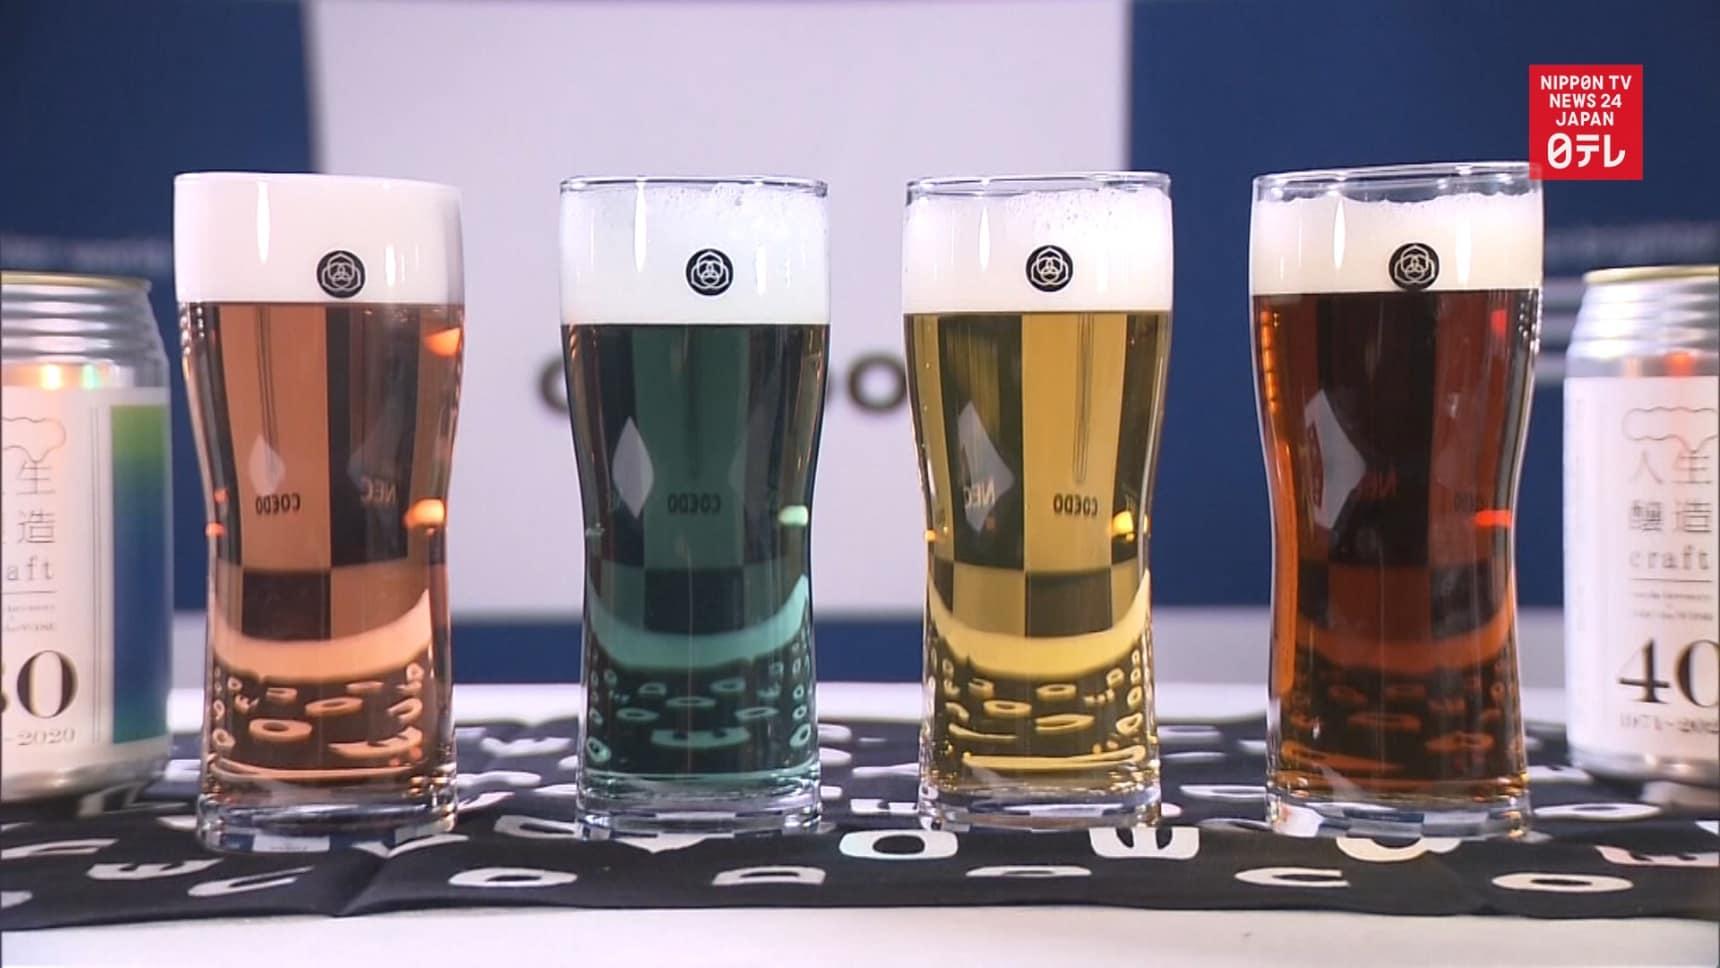 AI Bartender Serving Up Age-Based Craft Beers